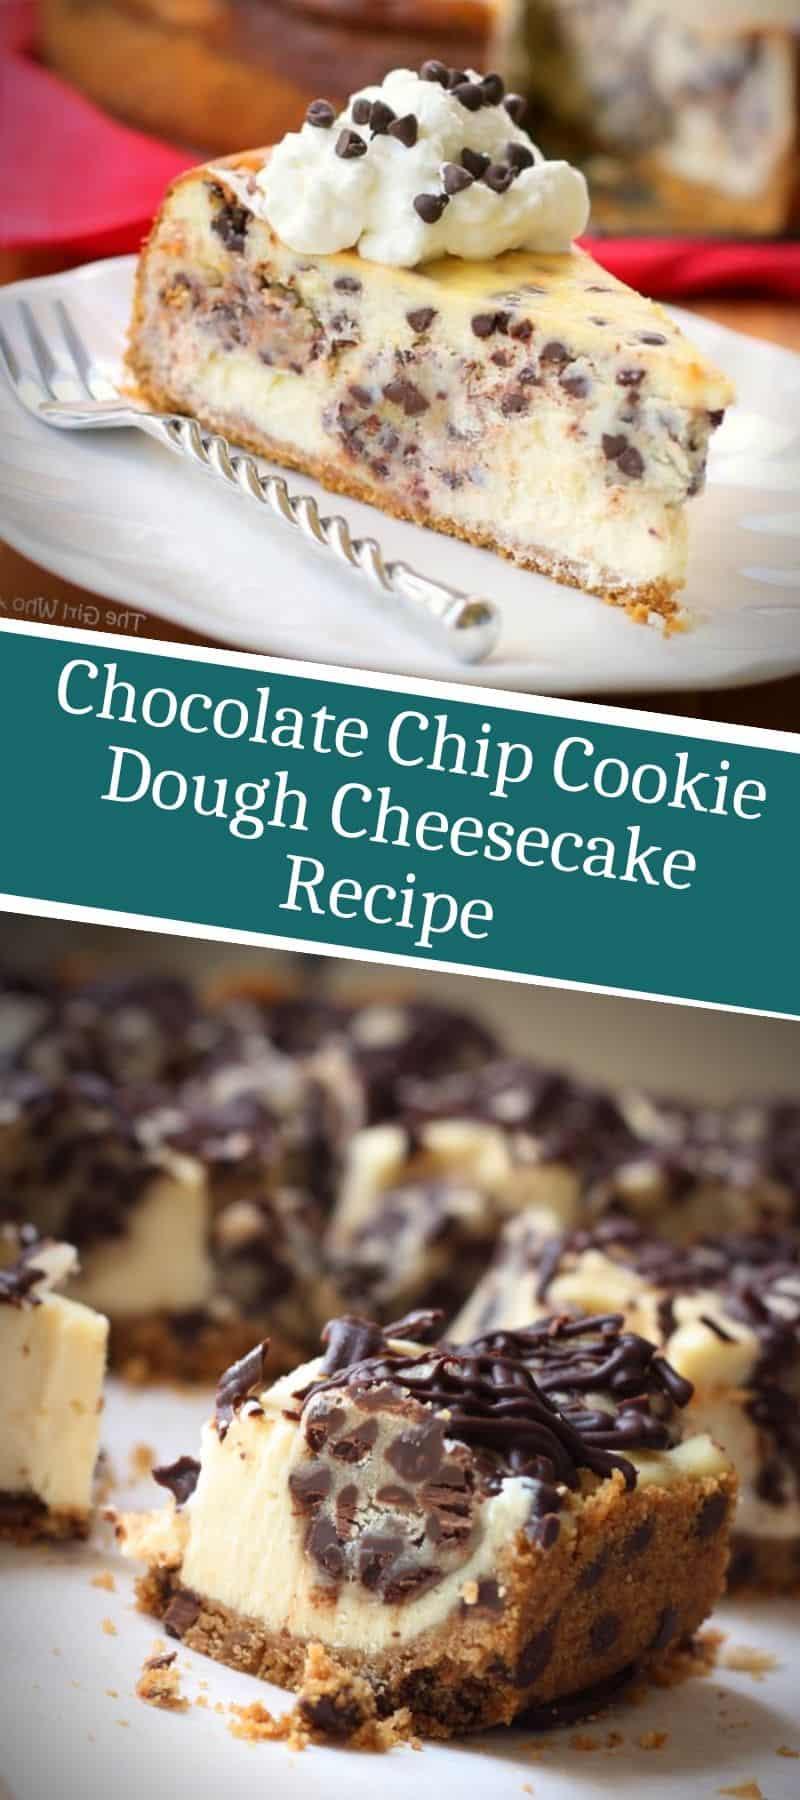 Chocolate Chip Cookie Dough Cheesecake Recipe 3